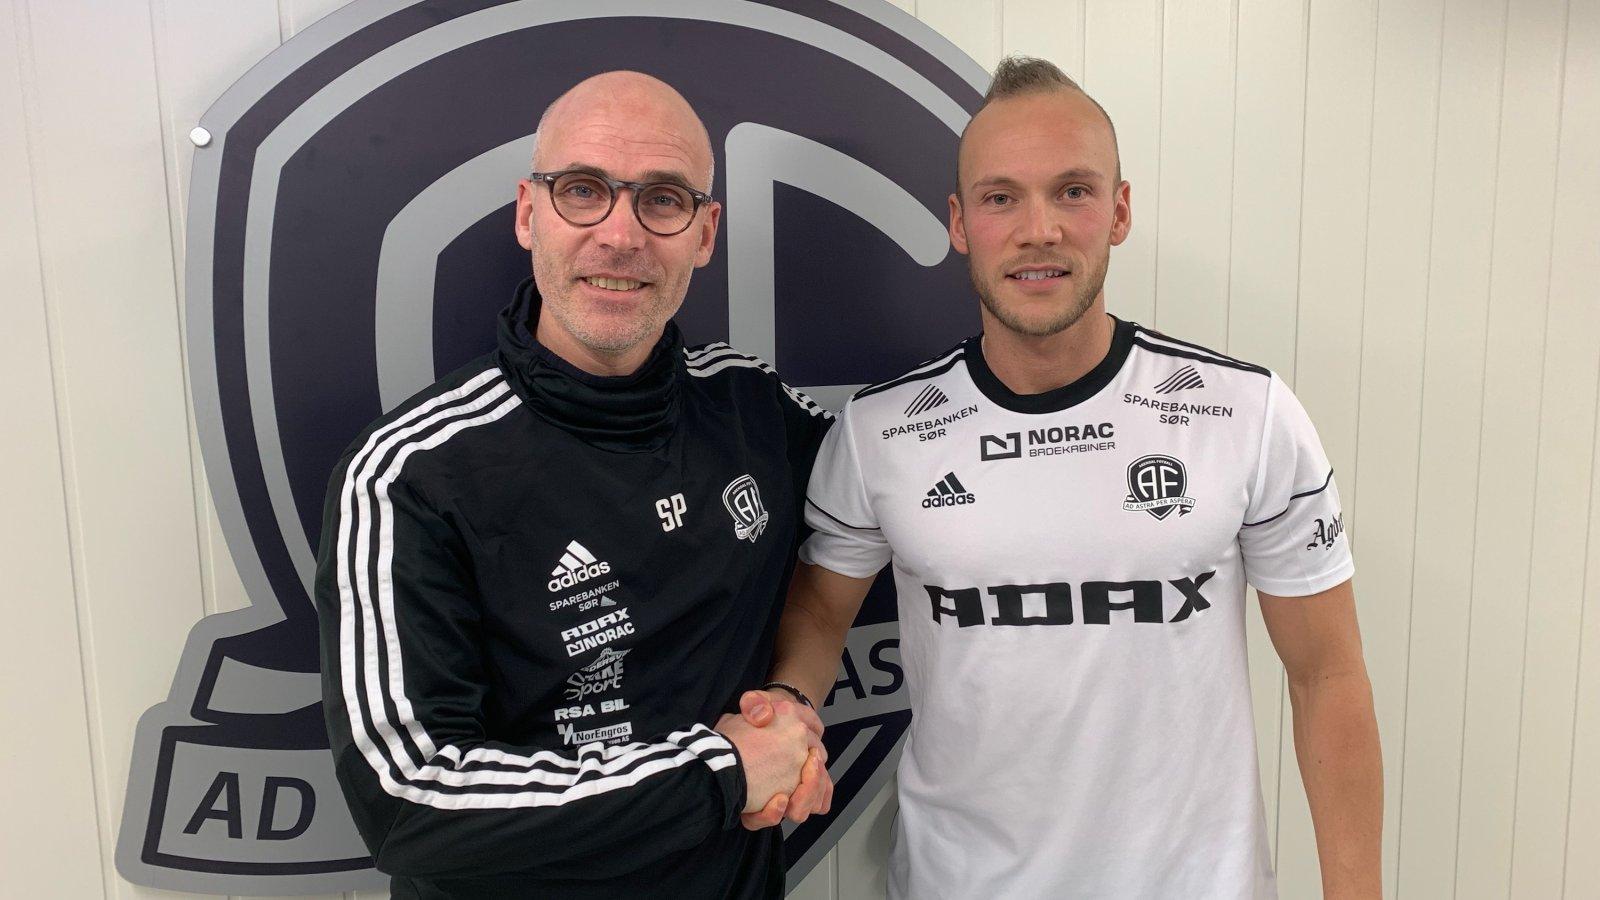 Steinar Pedersen kan ønske Omar Fonstad el Ghaouti velkommen til Norac stadion.